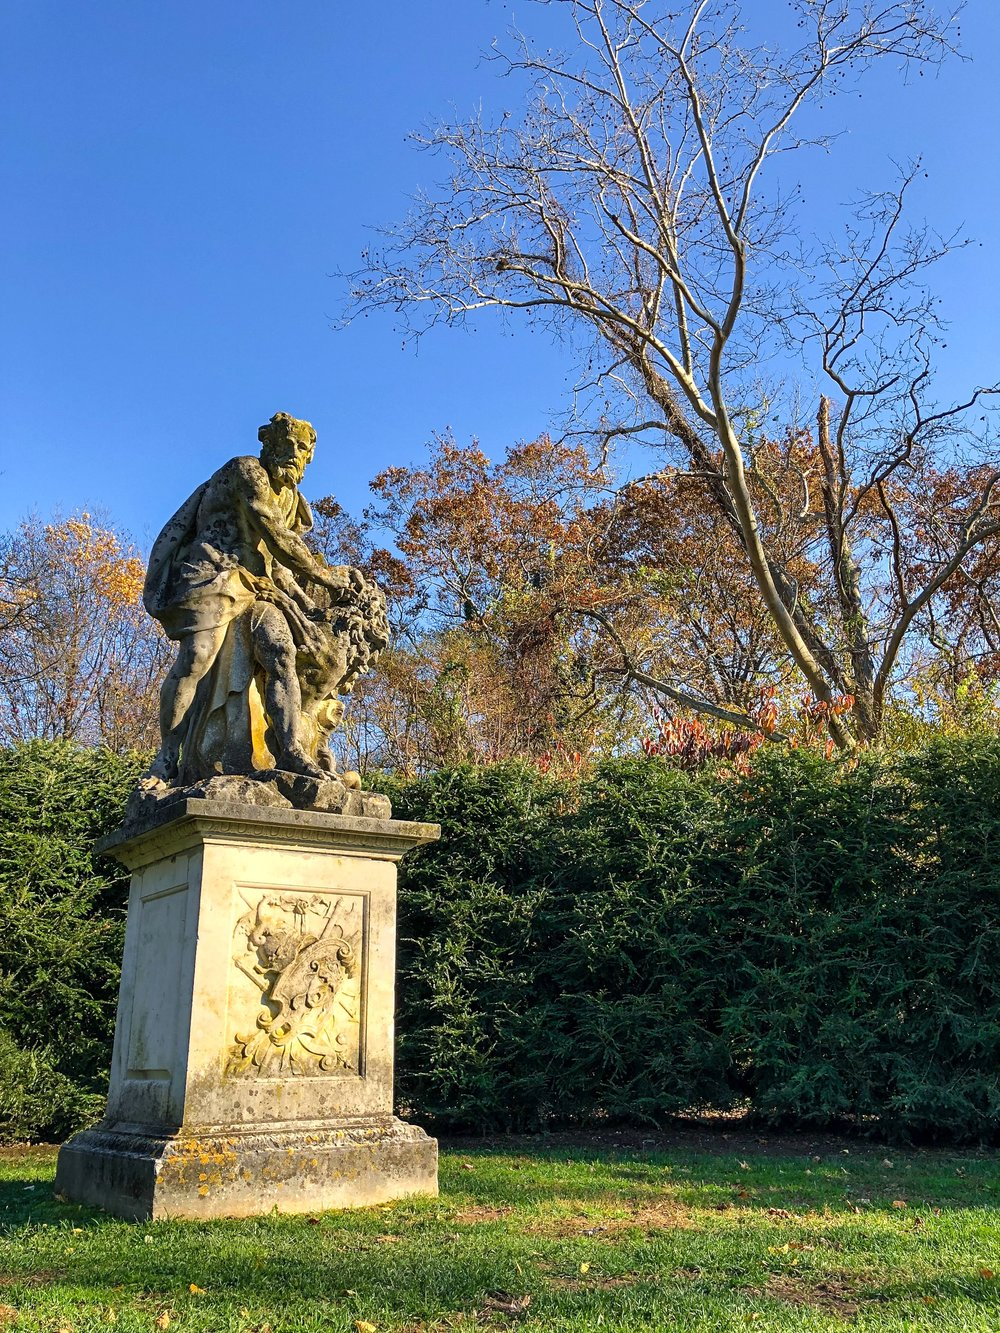 __@ ART-Old man & Lion_Old Westbury Gardens_11.11.18.jpg